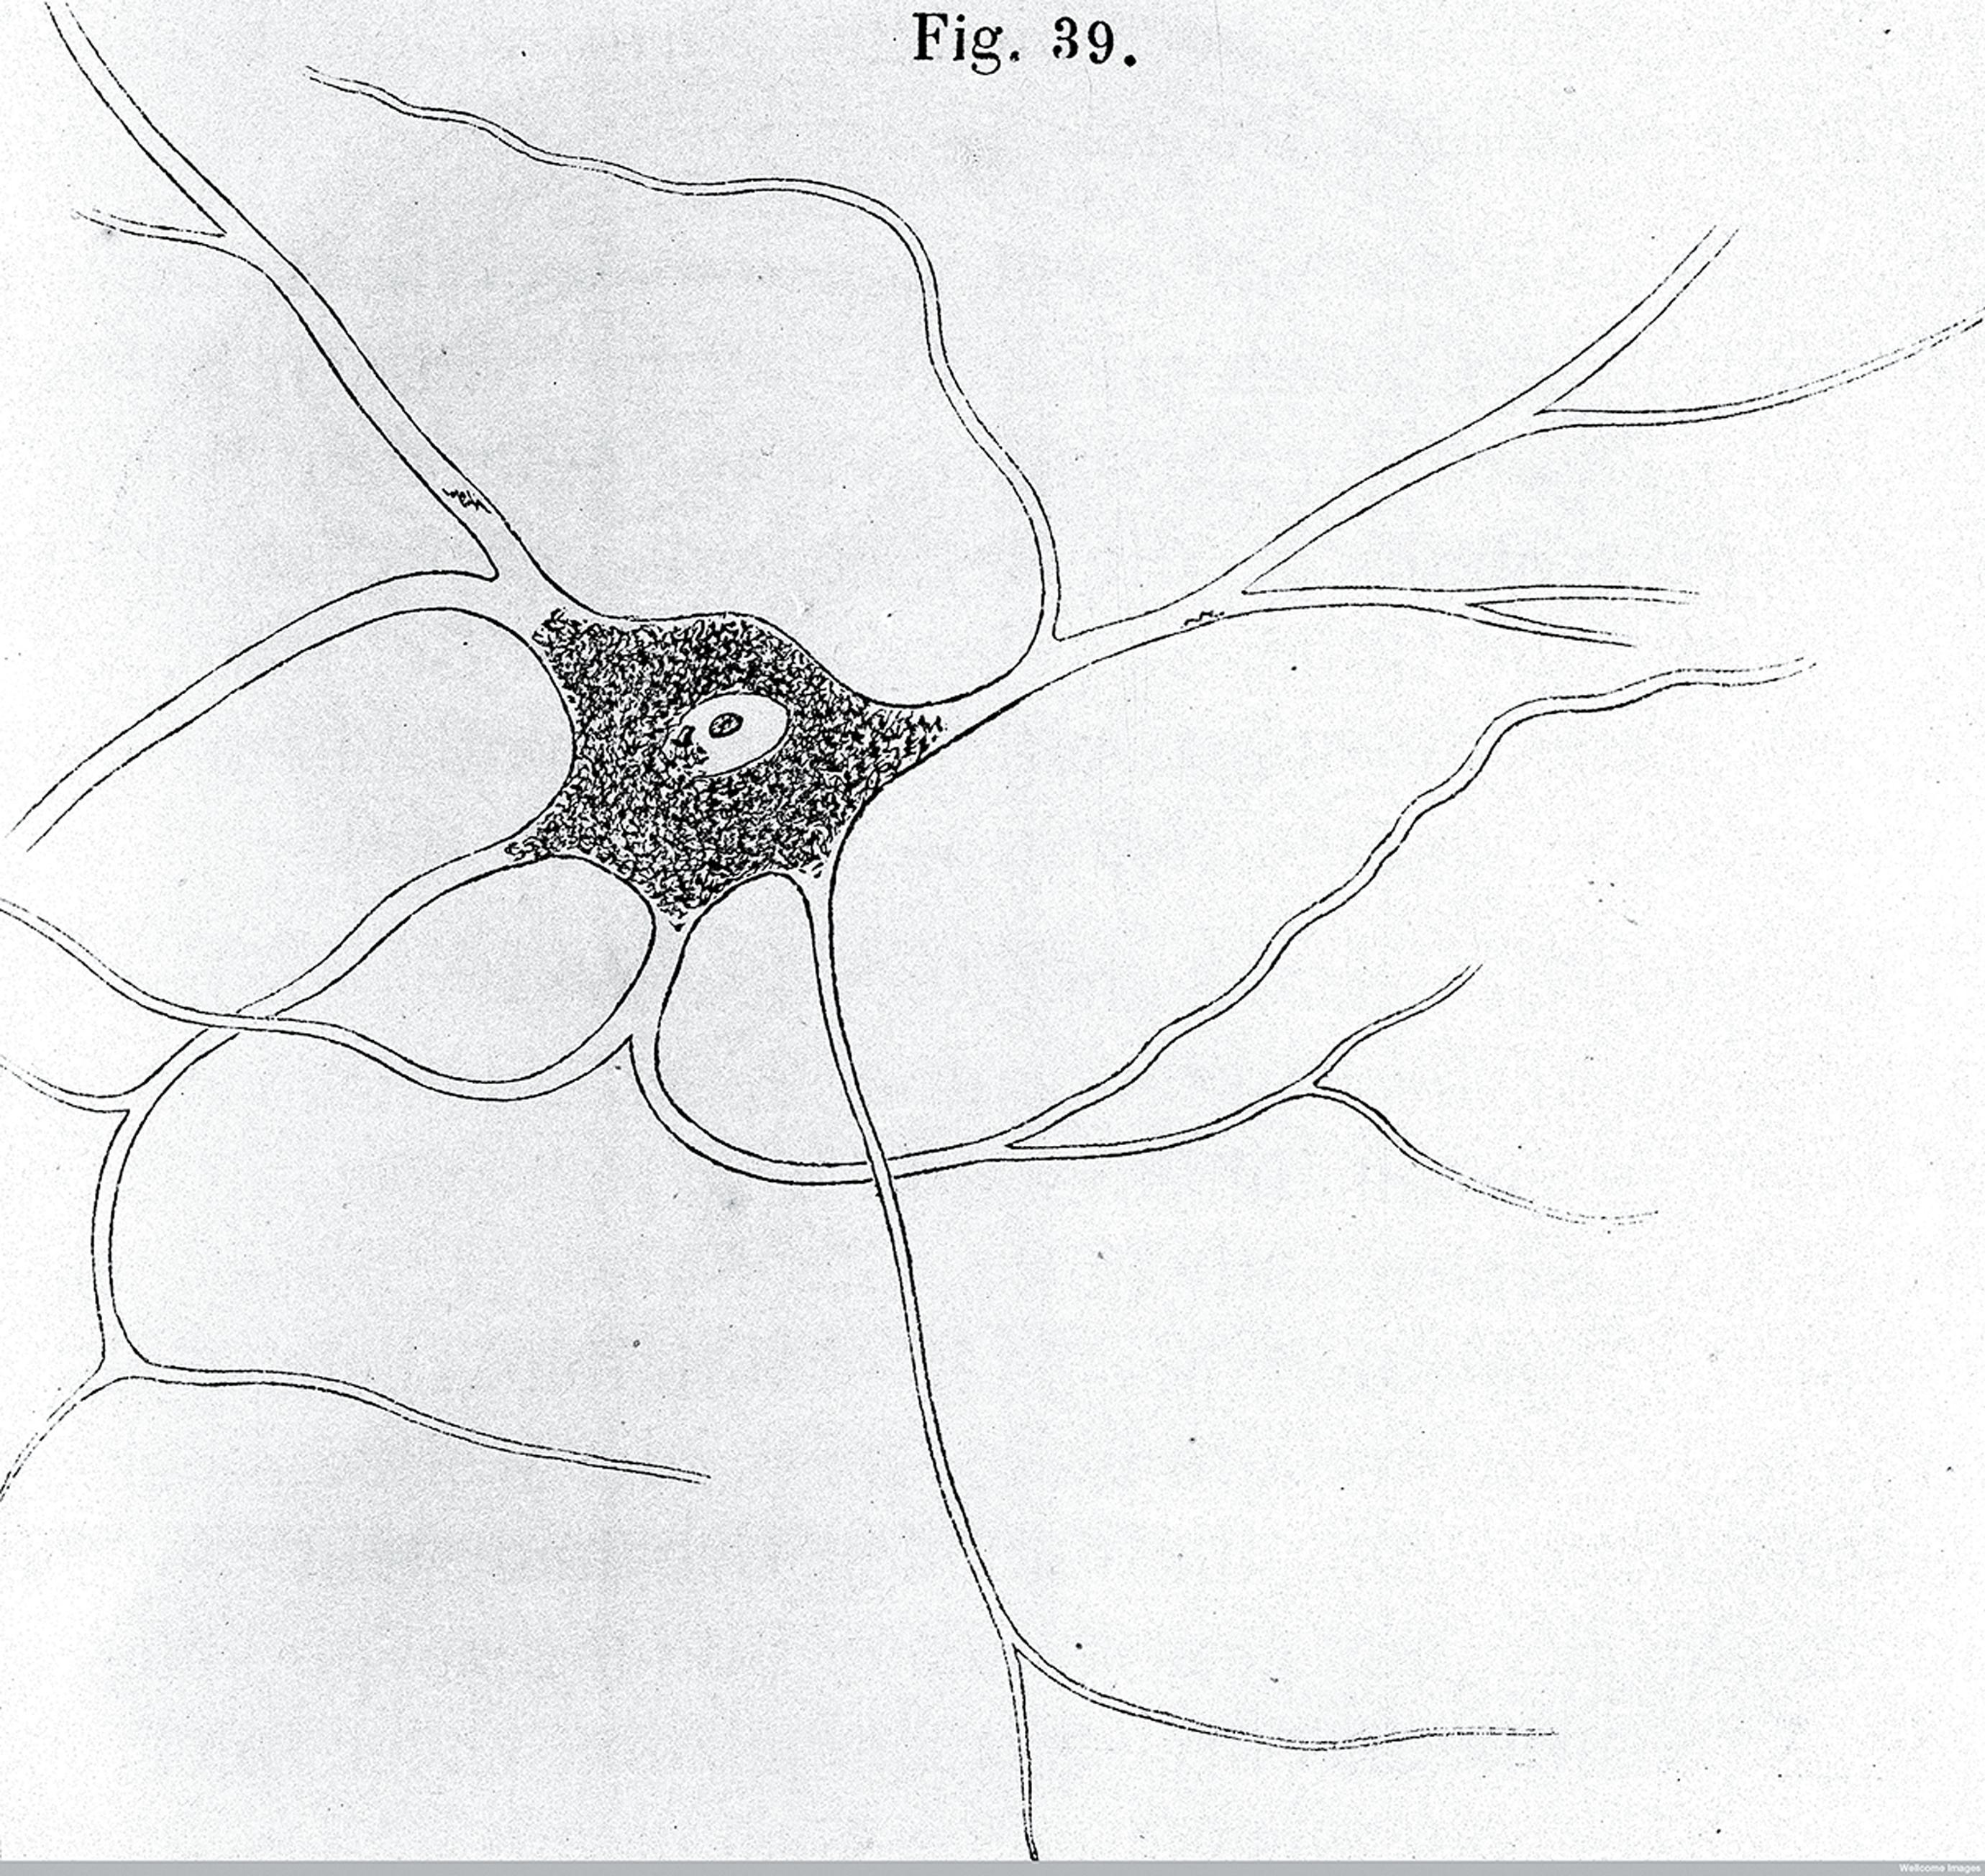 A nerve (A. von Kolliker, 1852).